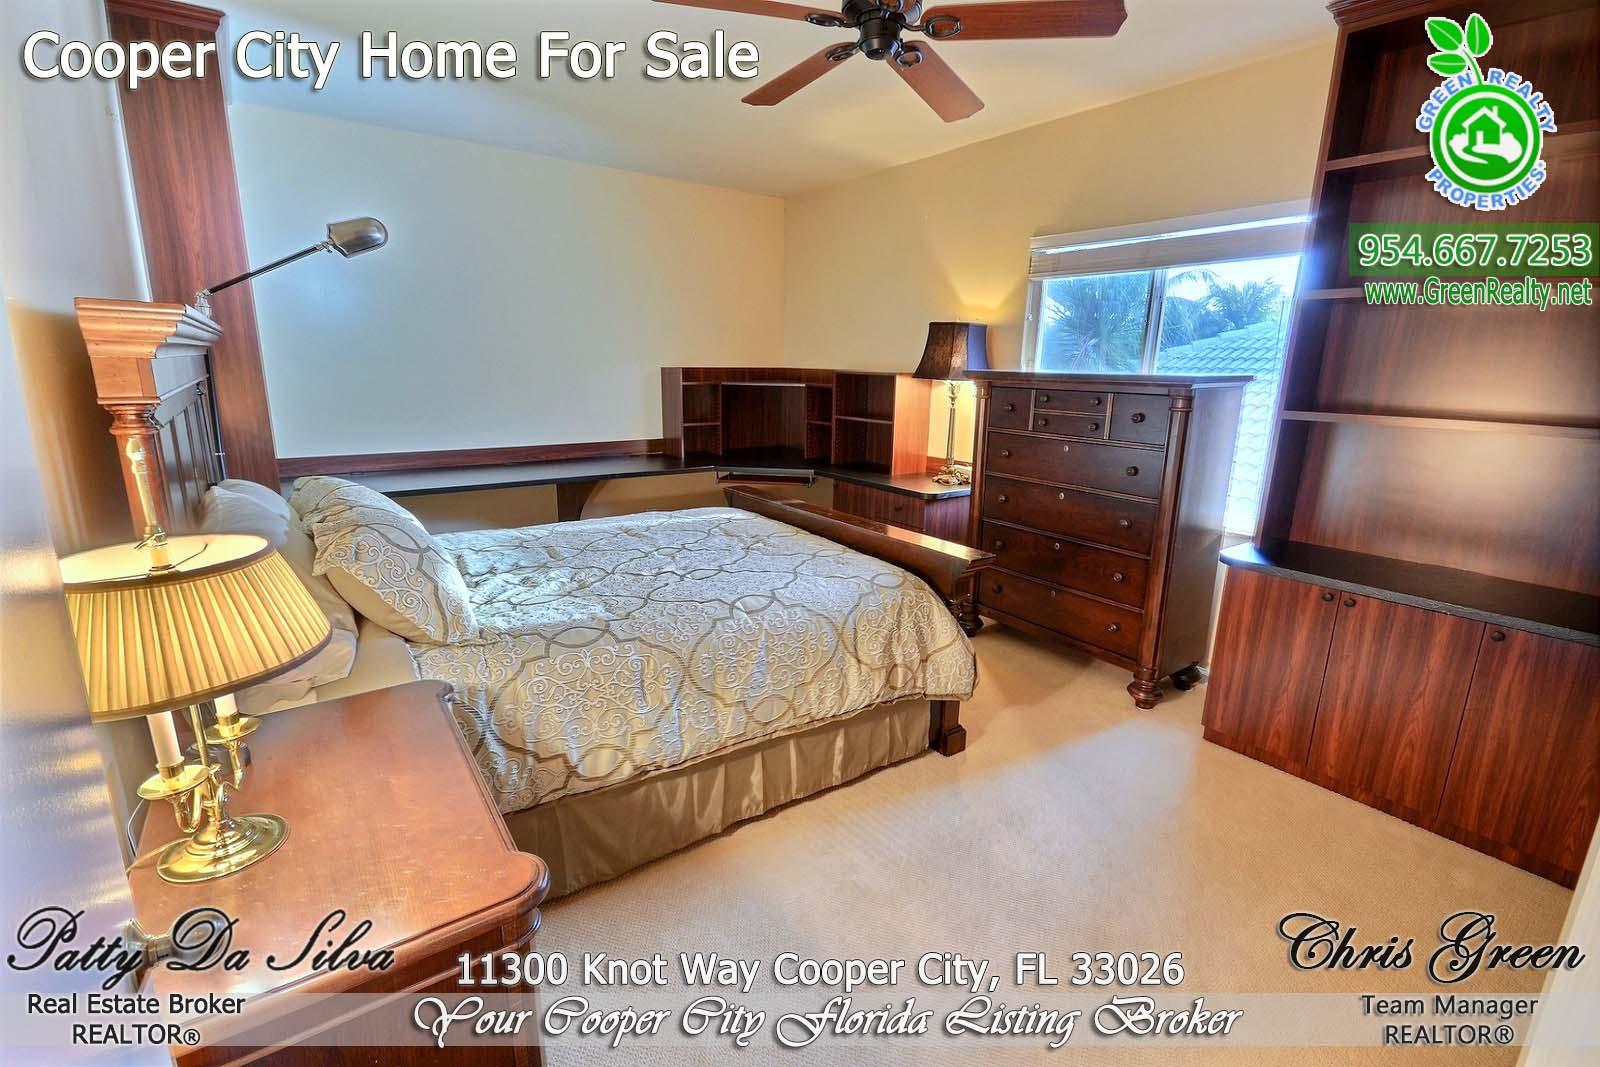 39 Homes For Sale in East Landing Rock Creek (2)